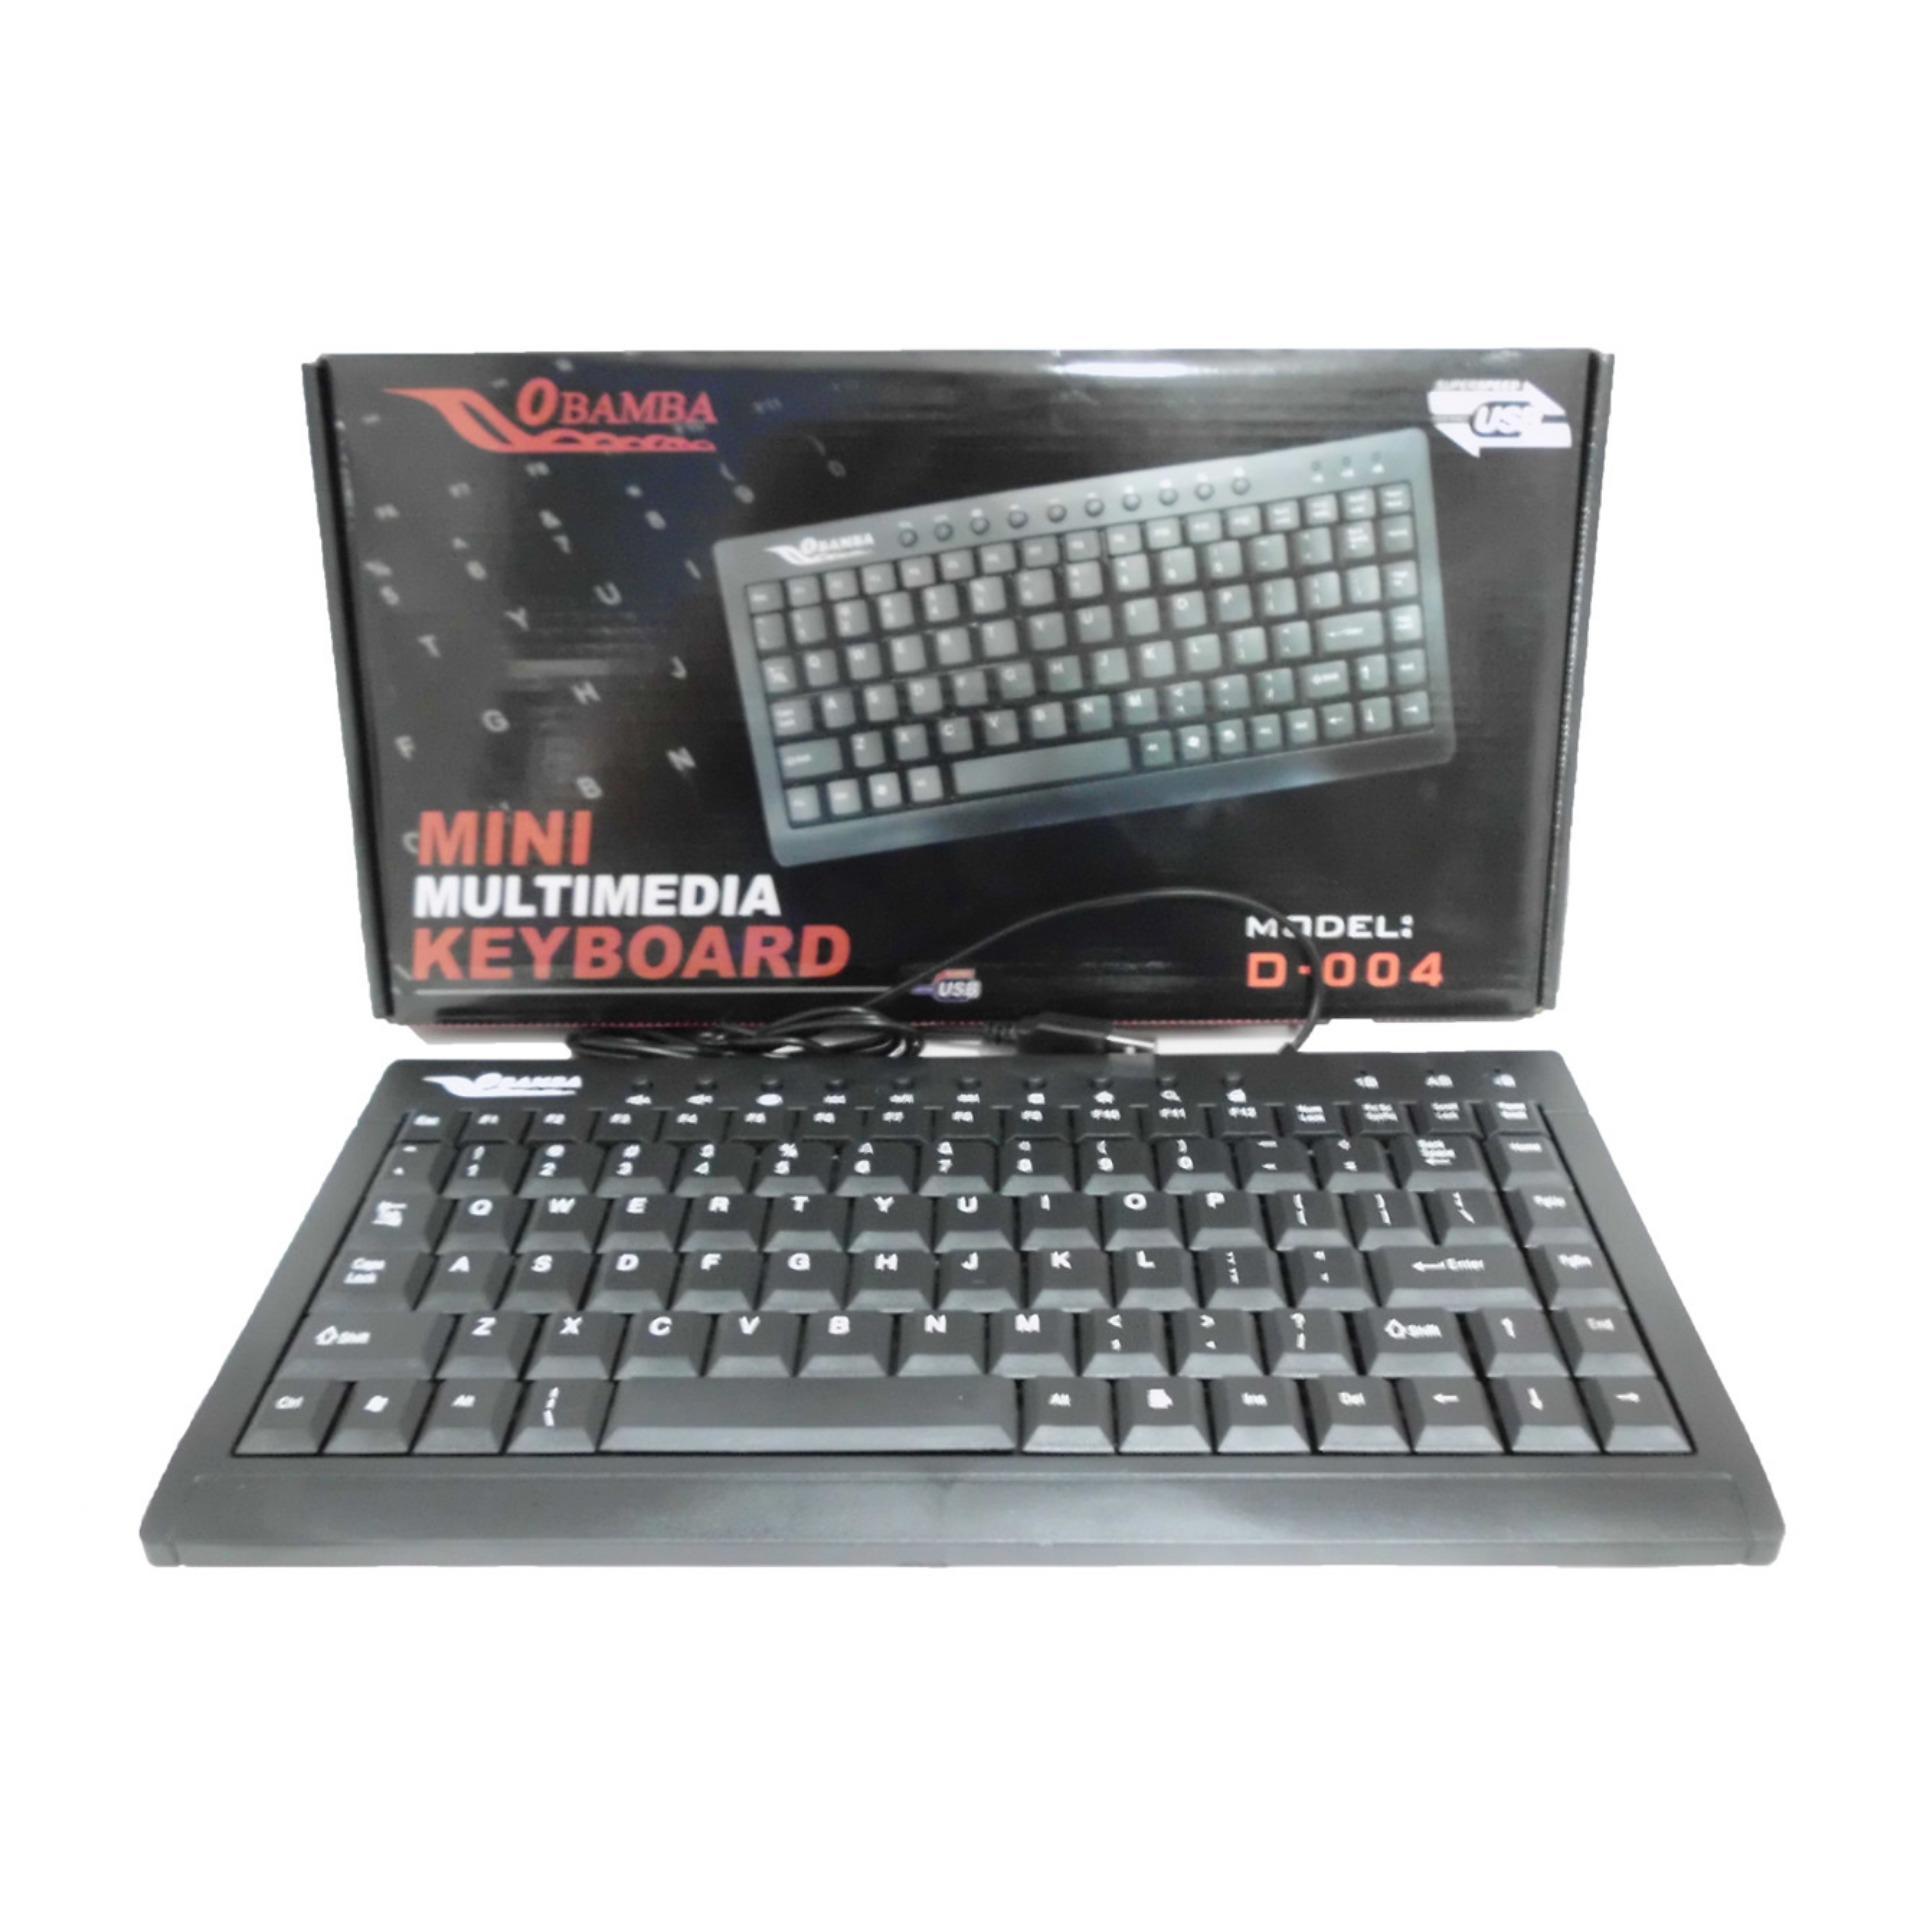 M Tech Keyboard Usb Angka Numeric Hitam Spec Dan Daftar Harga Marvo K945 Wired Gaming Full Mechanial Keyboards New Triniaga Solusi Cermat Source Obamba Multimedia Mini